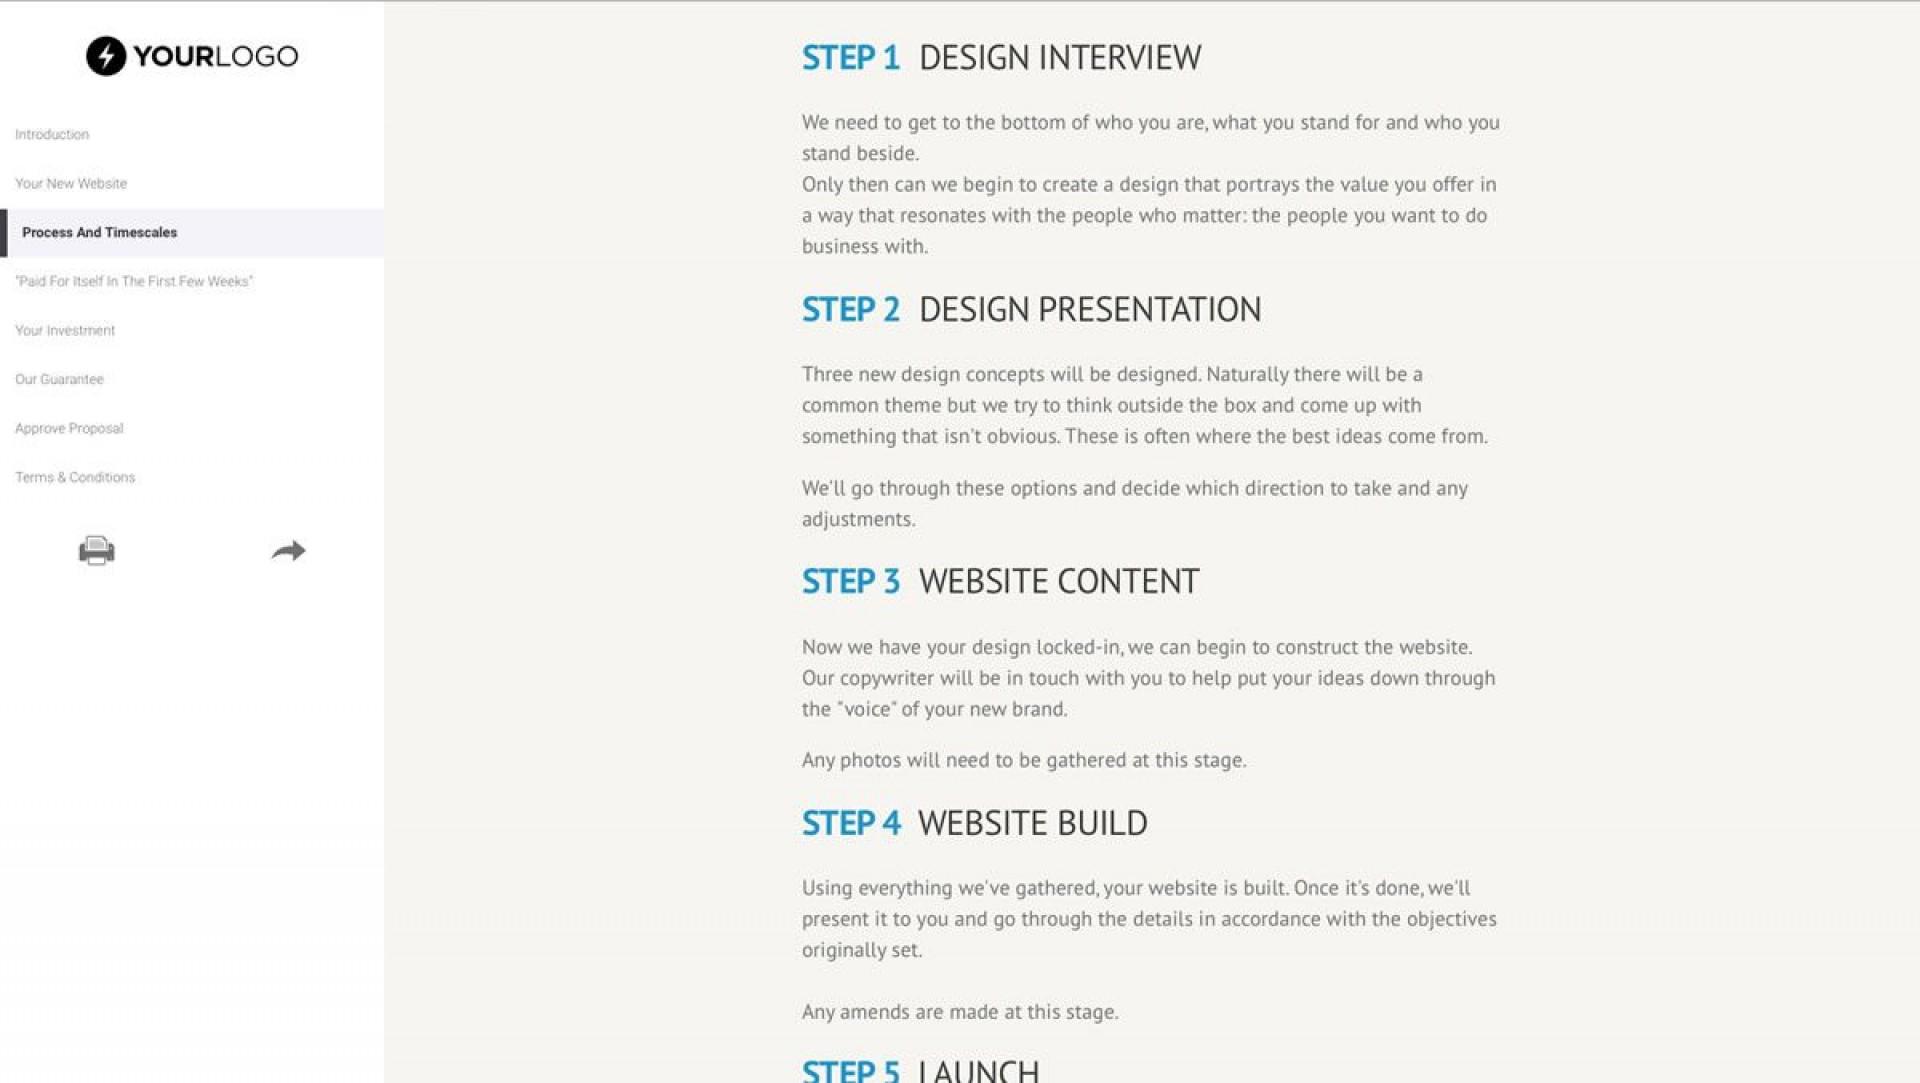 002 Wonderful Freelance Website Design Proposal Template High Definition 1920